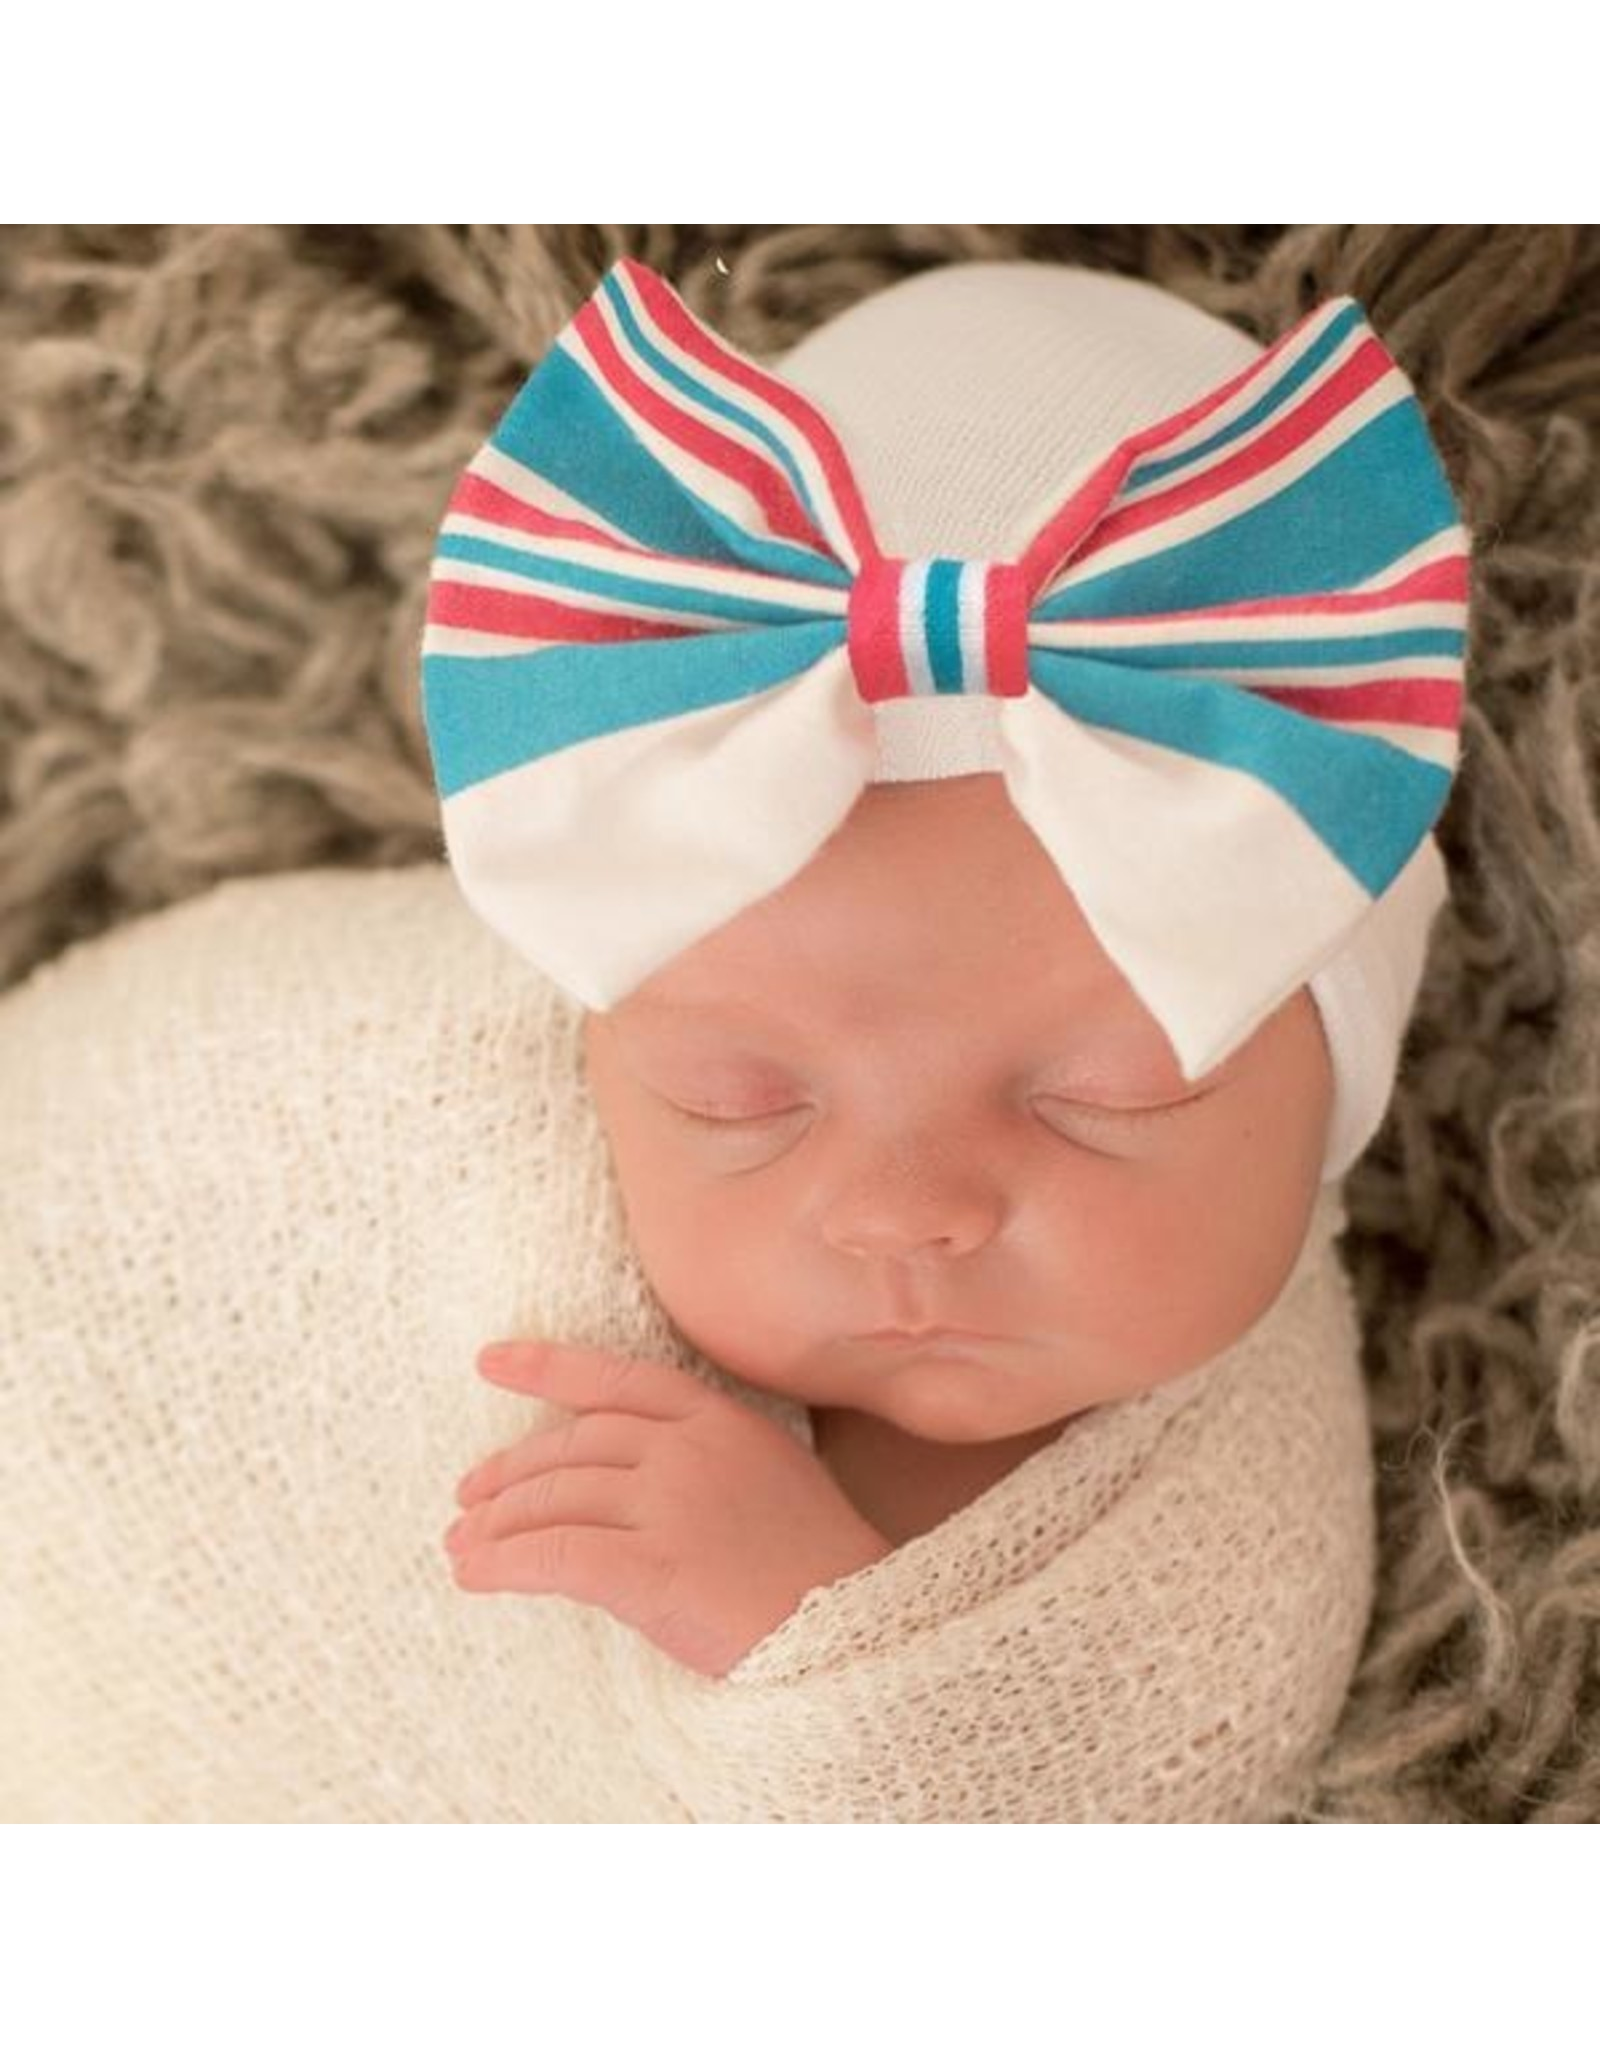 ILYBEAN Ilybean- Hospital Blanket Bow Nursery Beanie